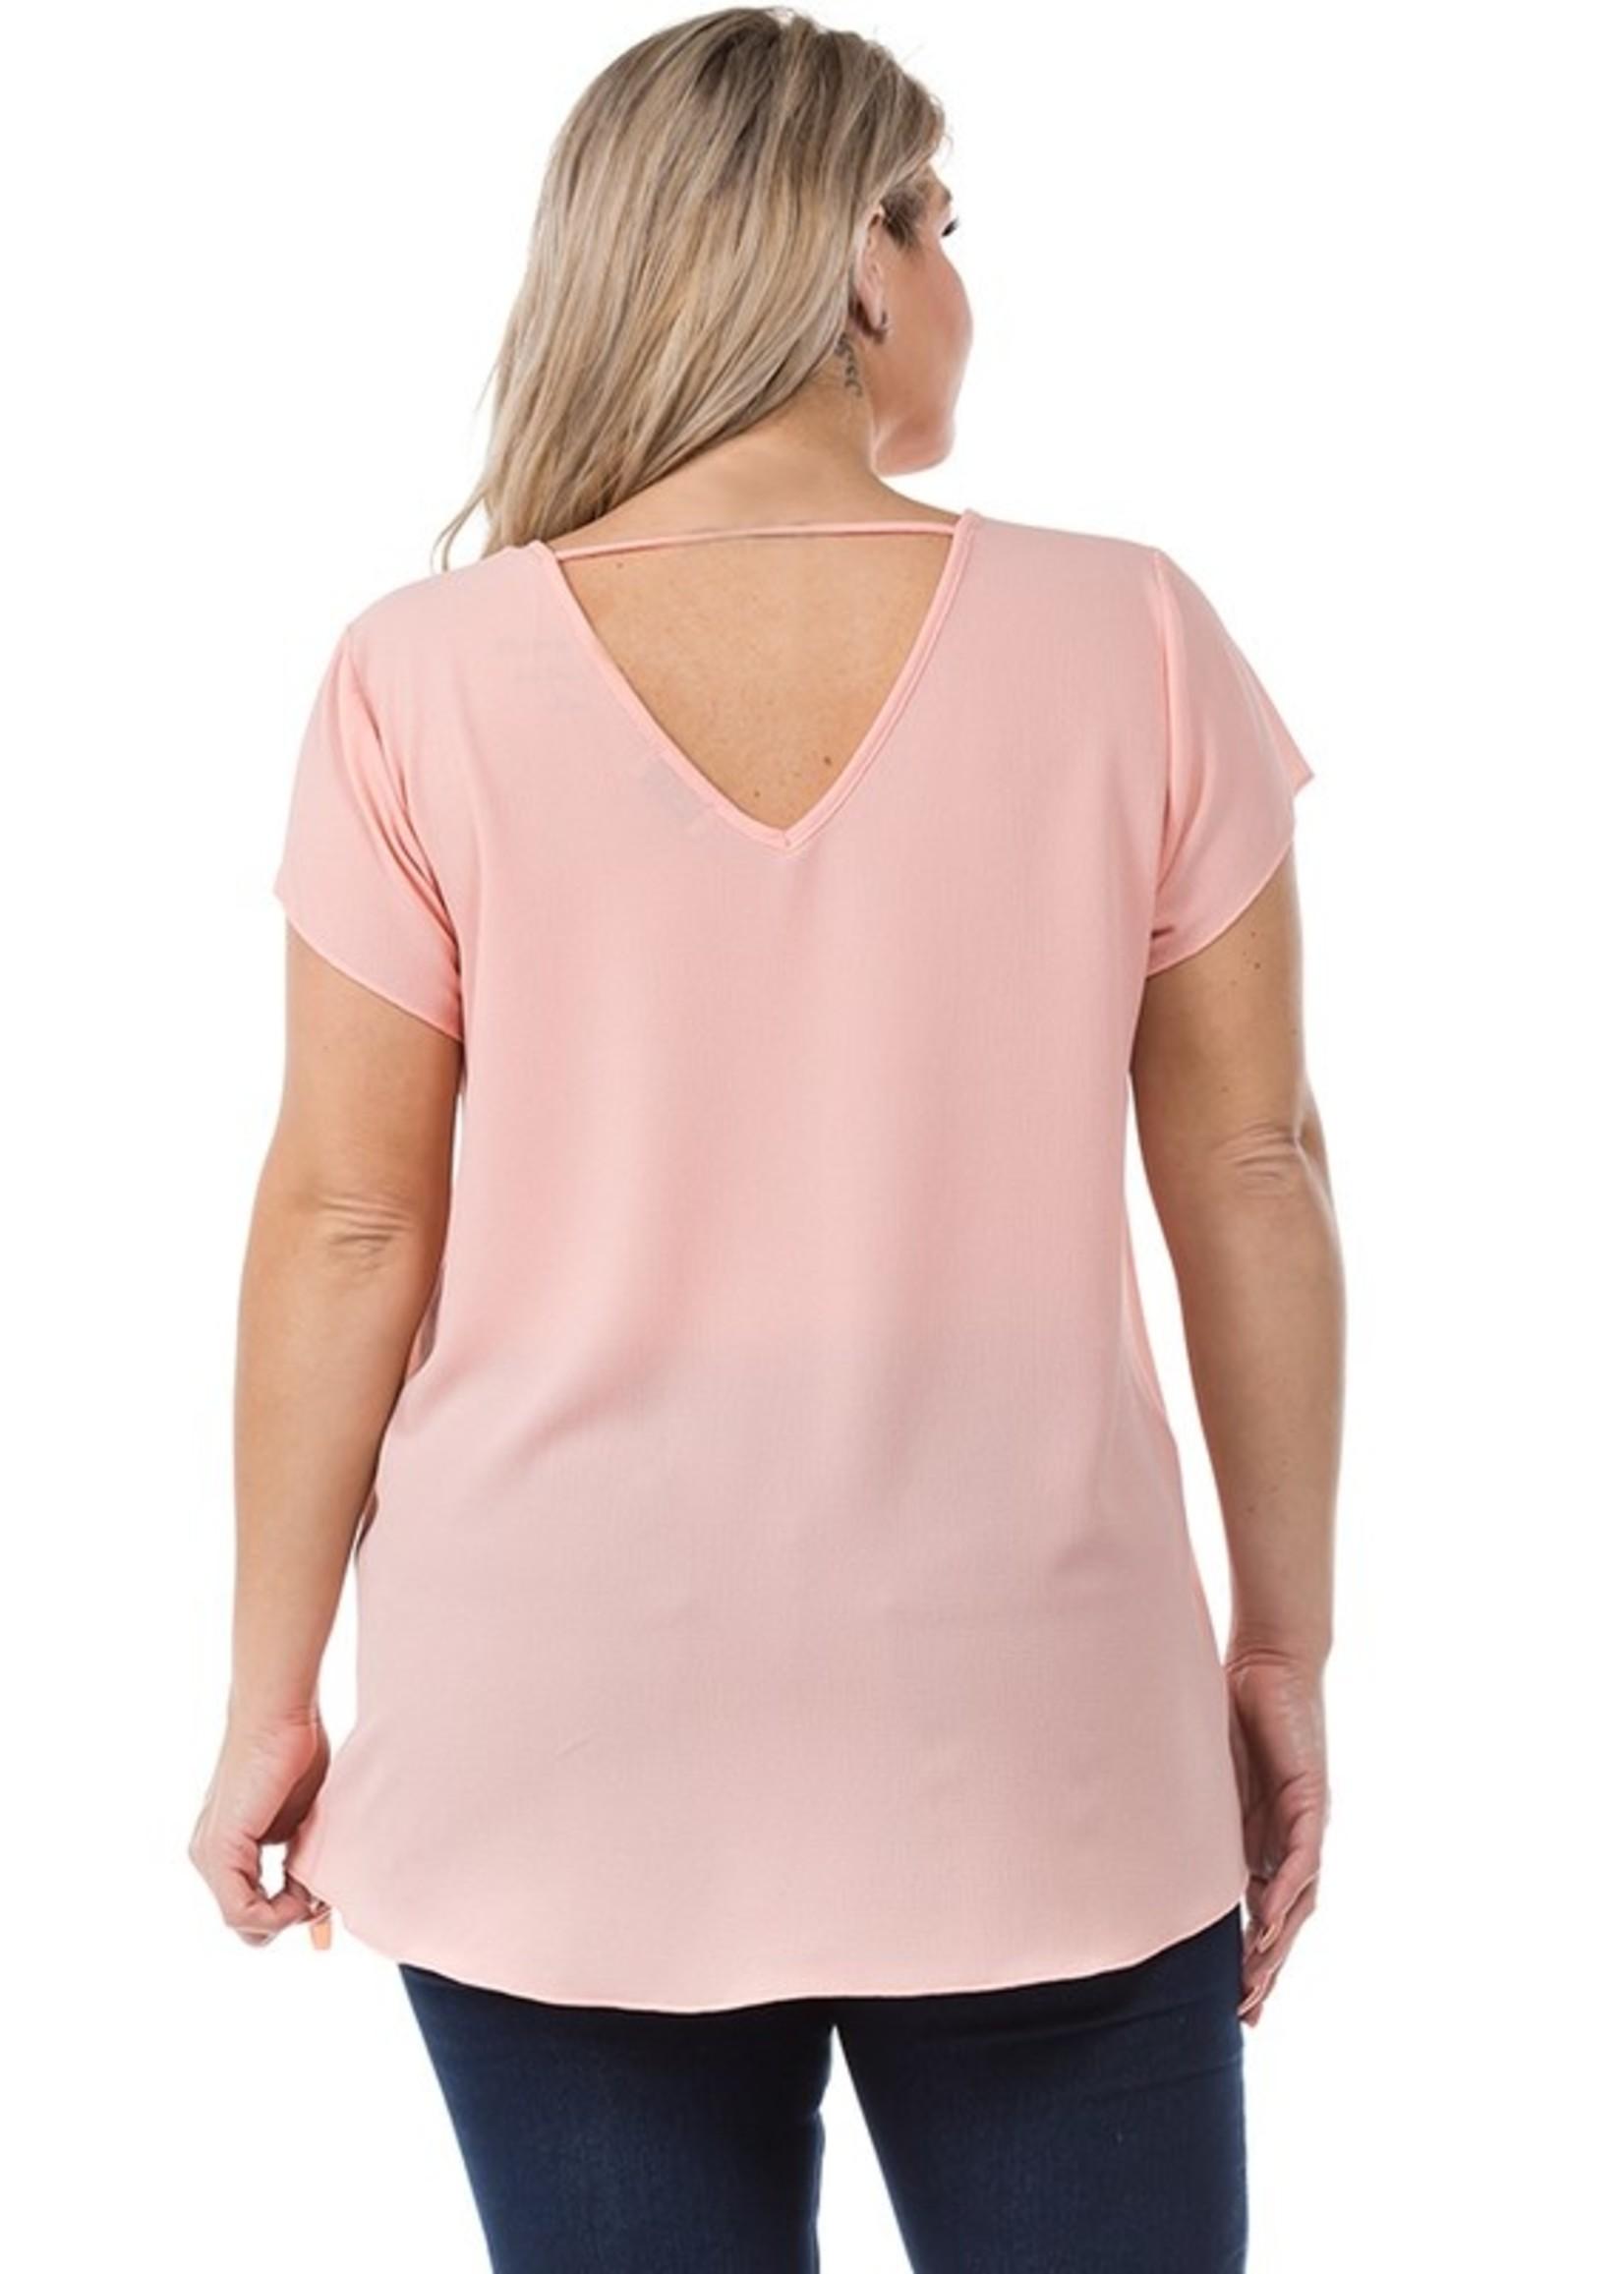 Spin USA Short Sleeve V Neck Dressy Top